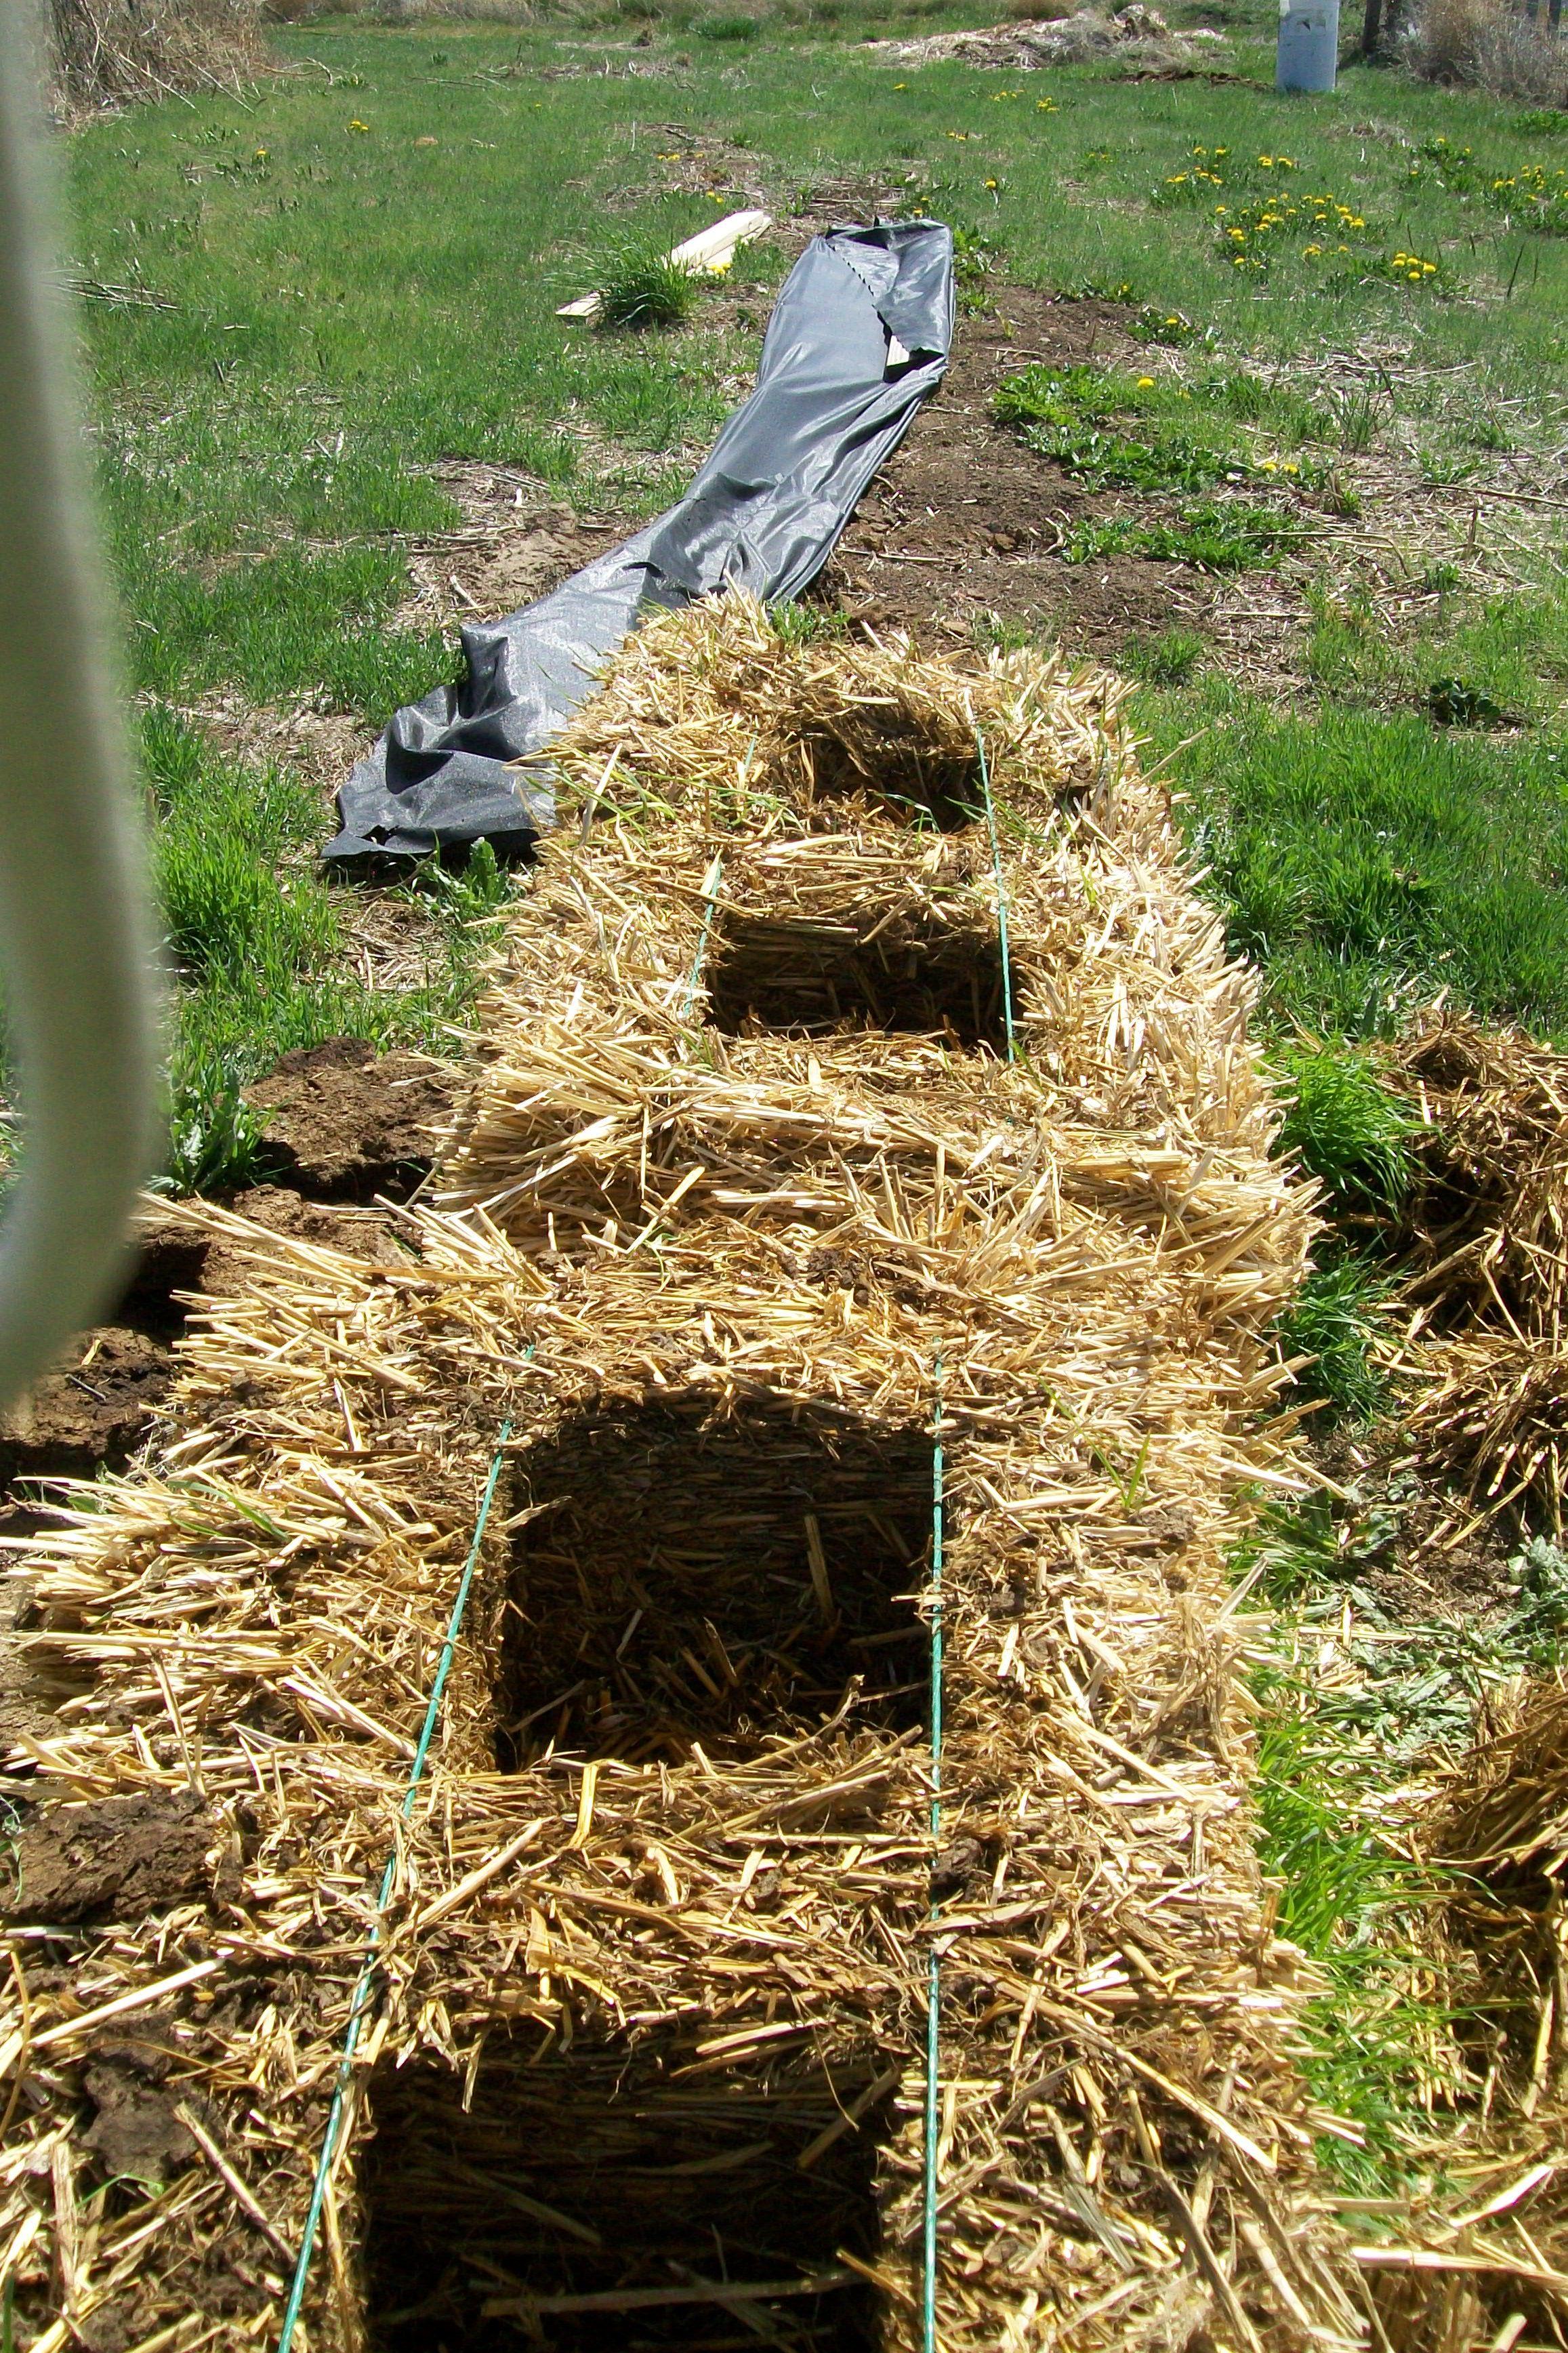 straw bale gardening means a lot of digging   Straw Bale Gardening ...